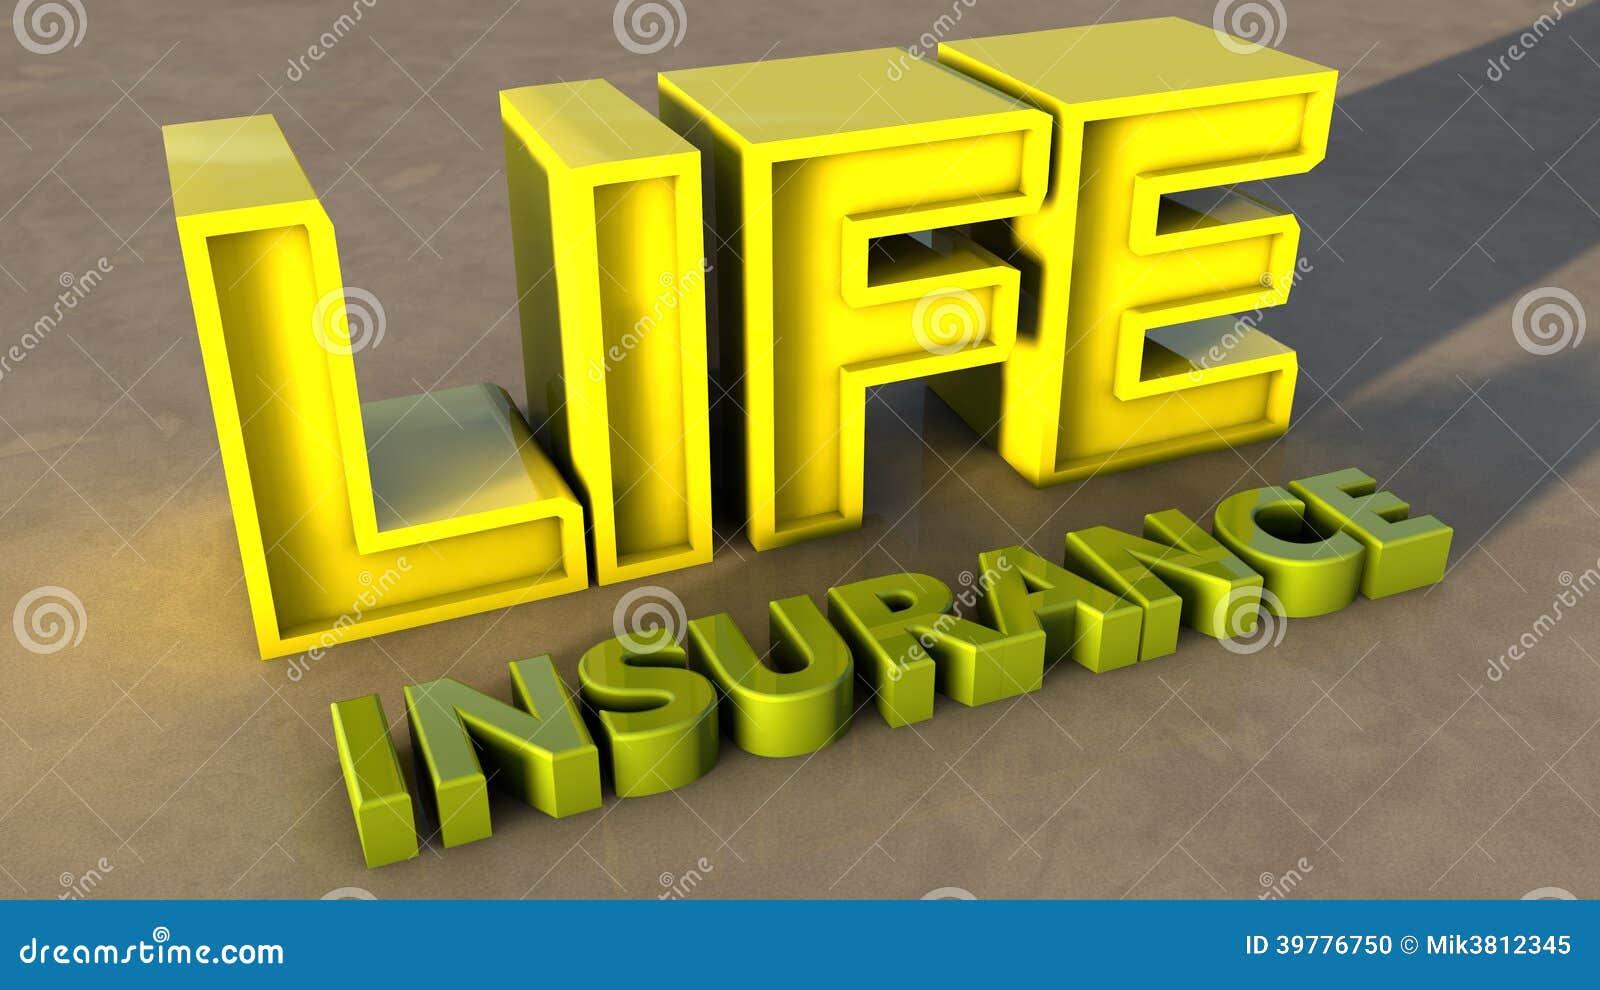 Life Insurance Stock Illustration - Image: 39776750